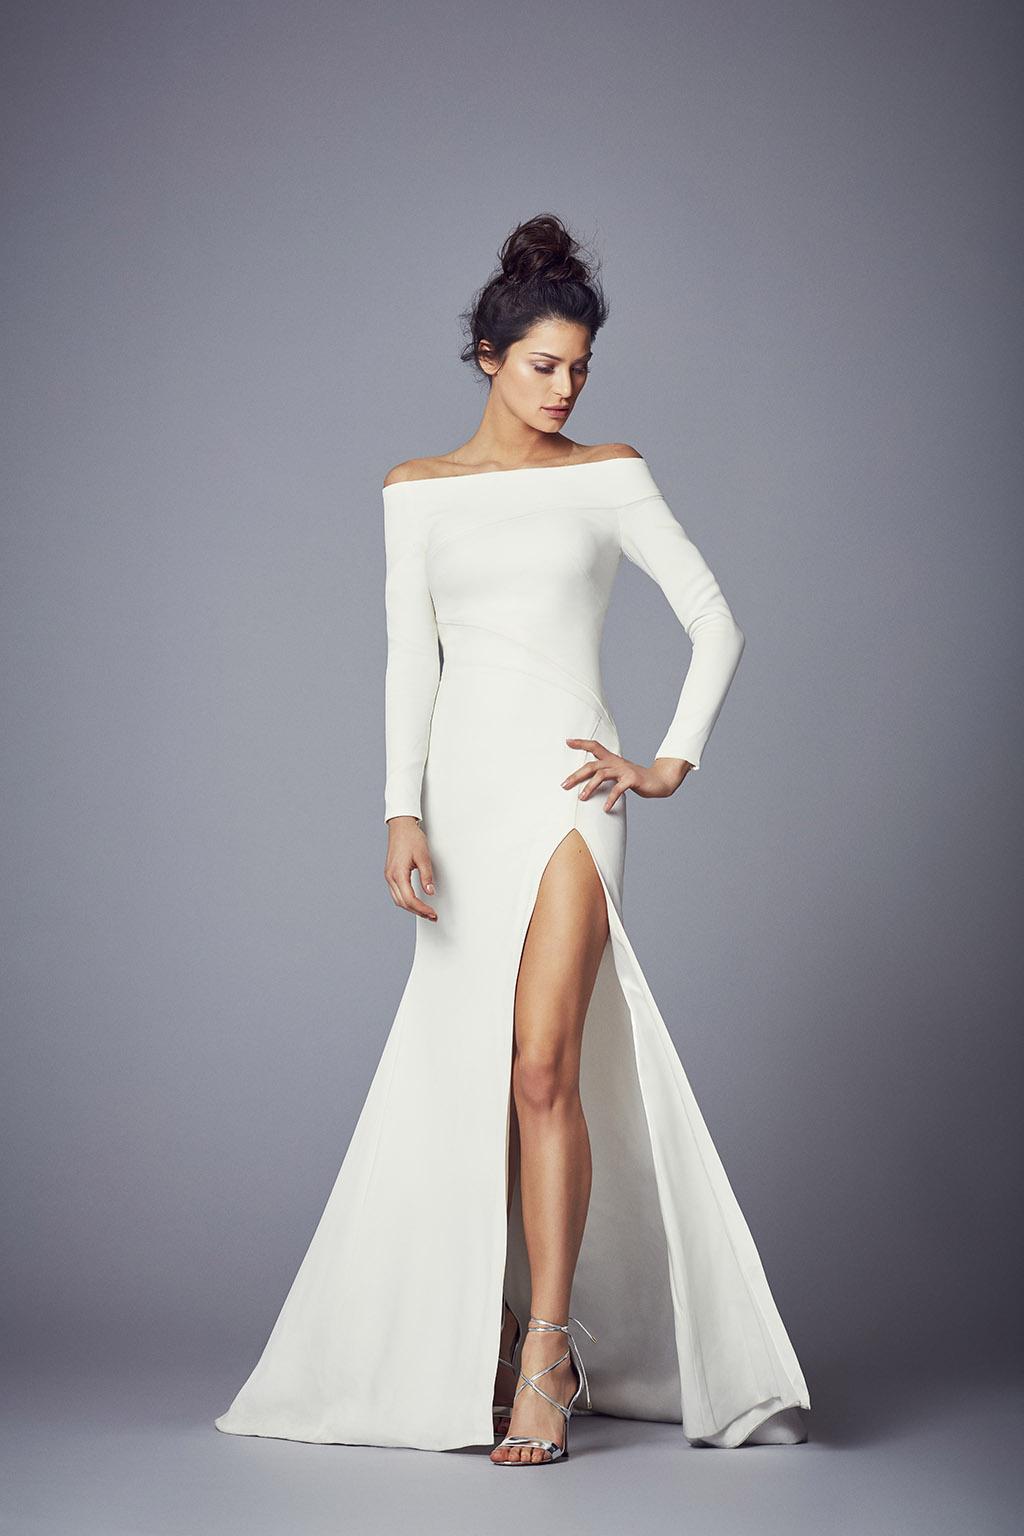 evening wedding dresses photo - 1